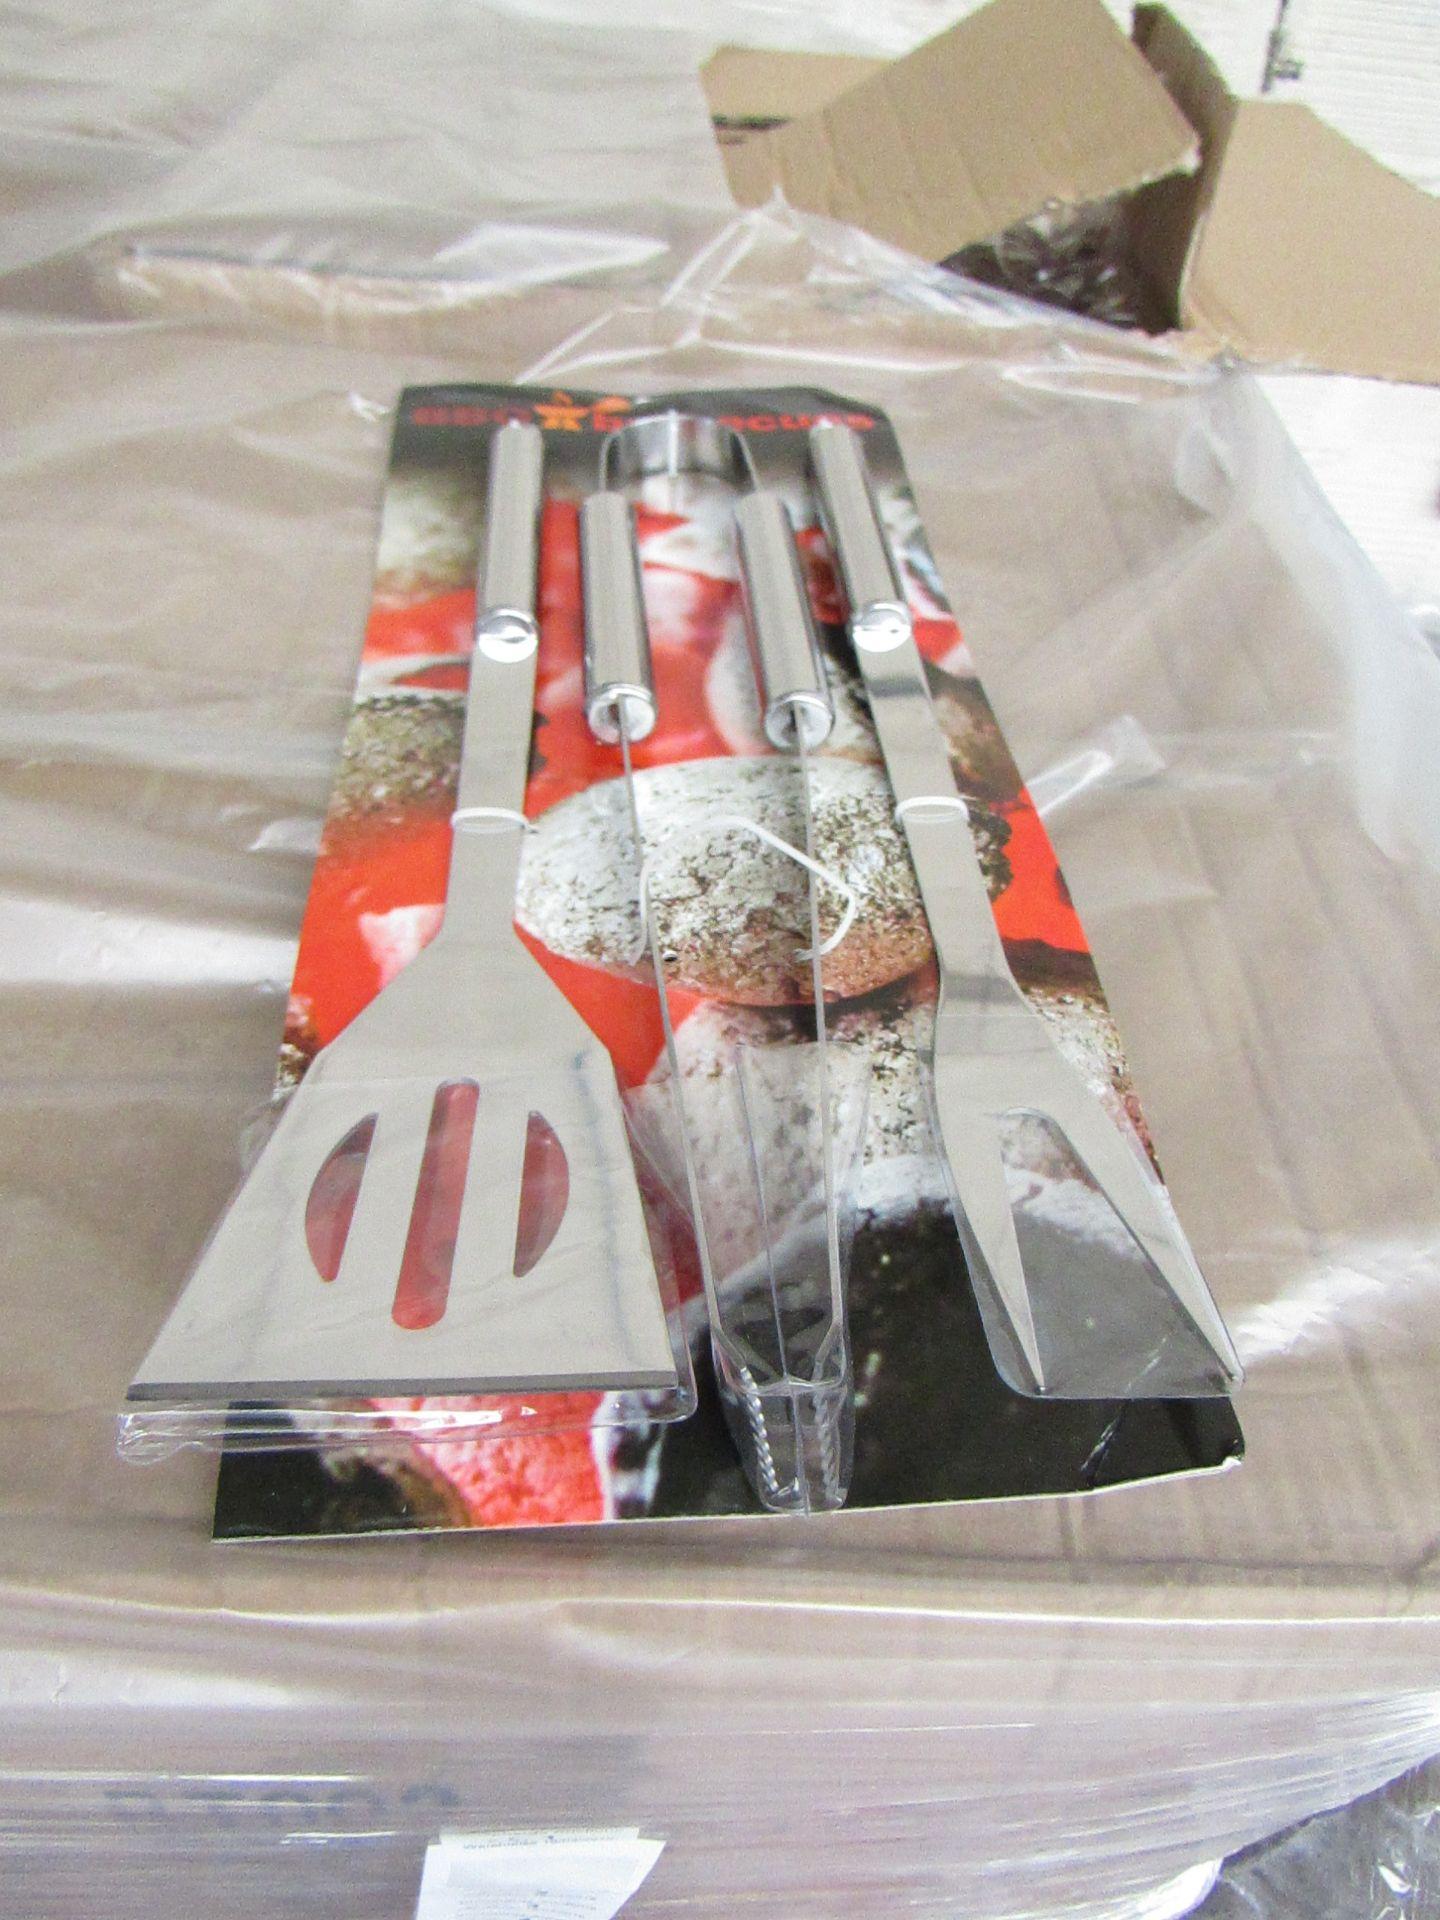 Lot 2 - 5x 3 piece BBQ tool kits, new still attached to POS